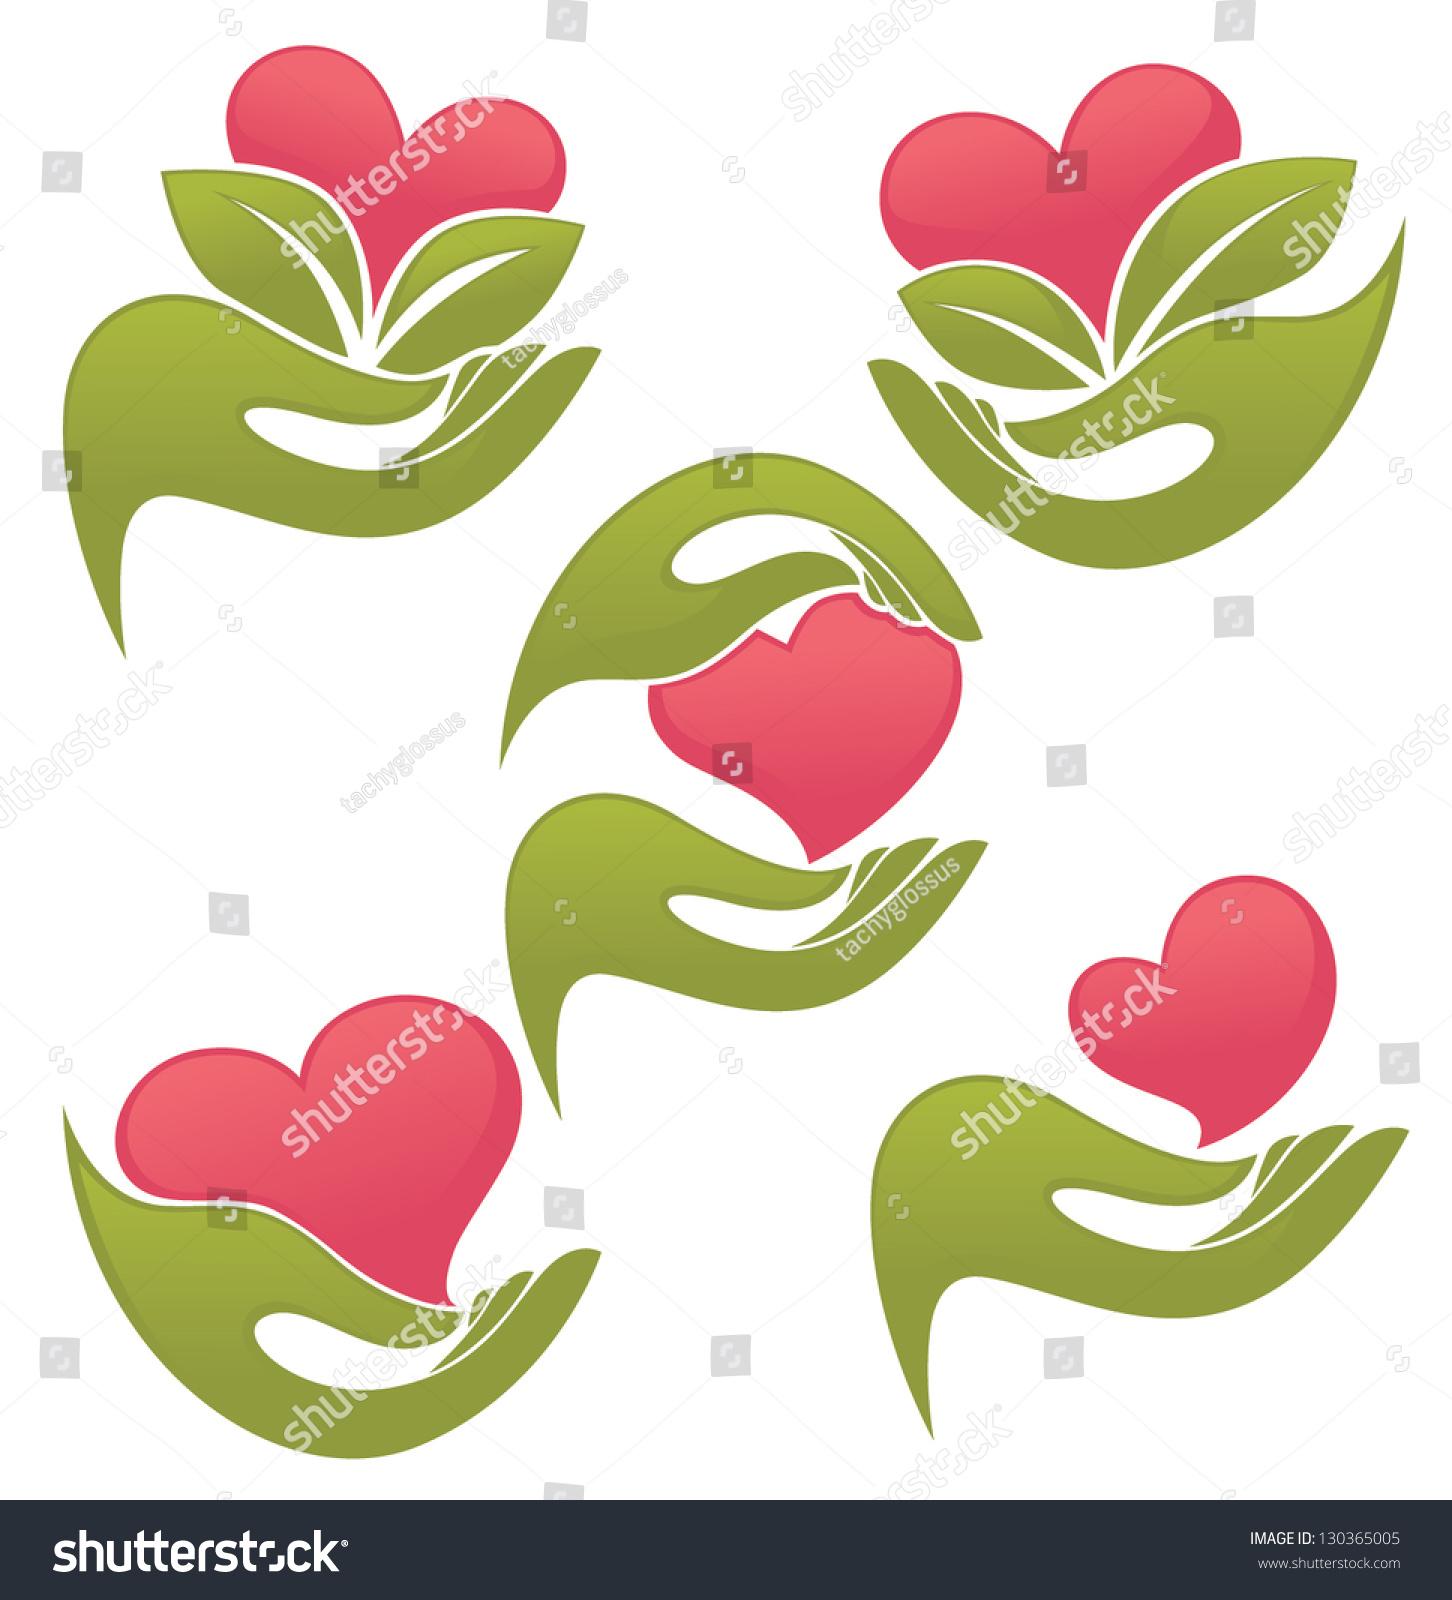 Love My Heart Symbols Humans Hands Stock Vector Royalty Free